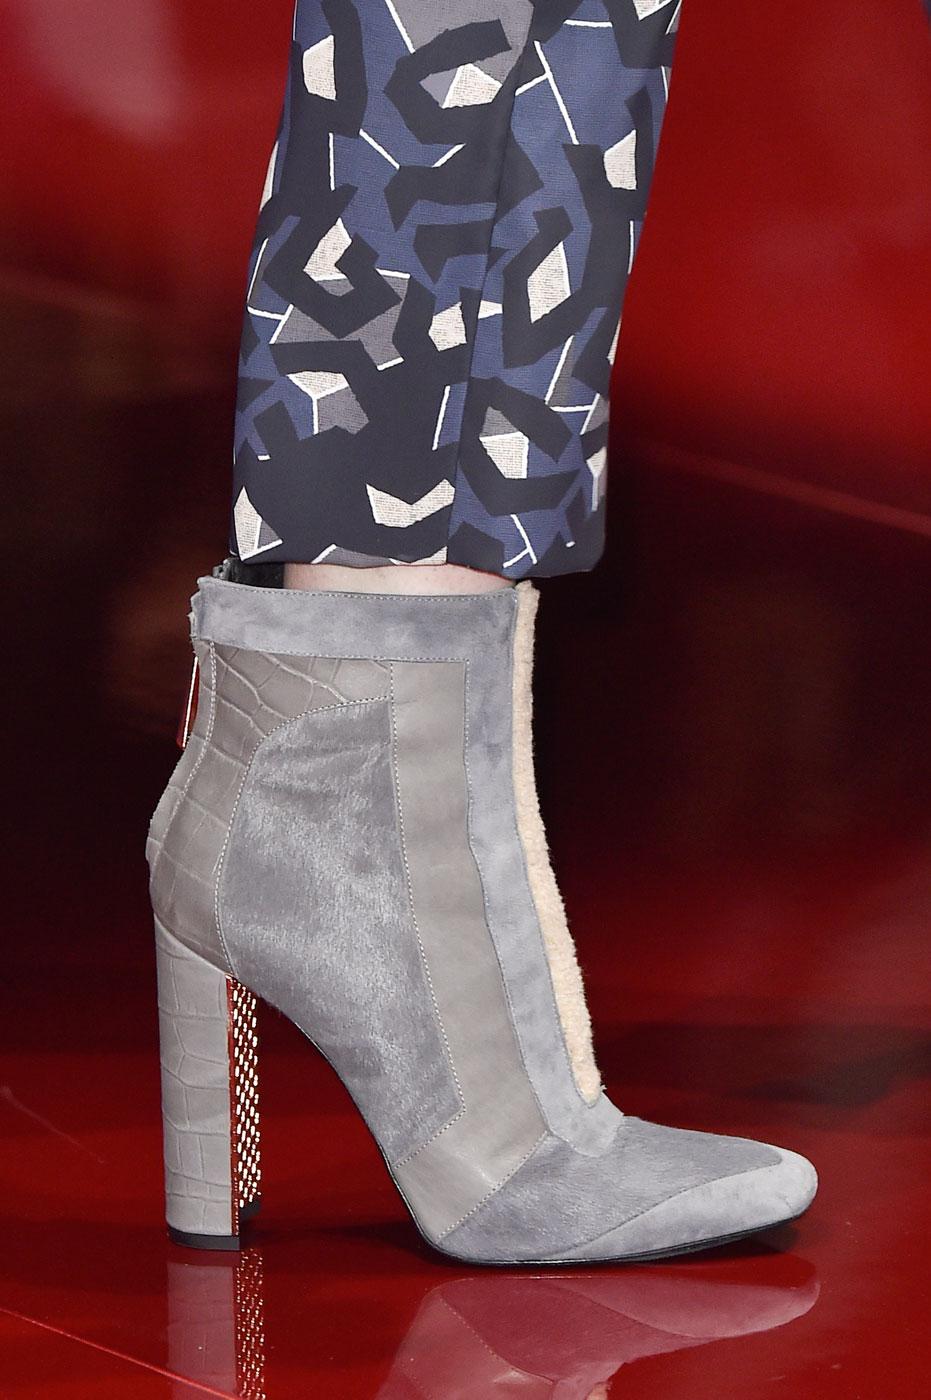 novinki-modnoj-zimnej-zhenskoj-obuvi-10